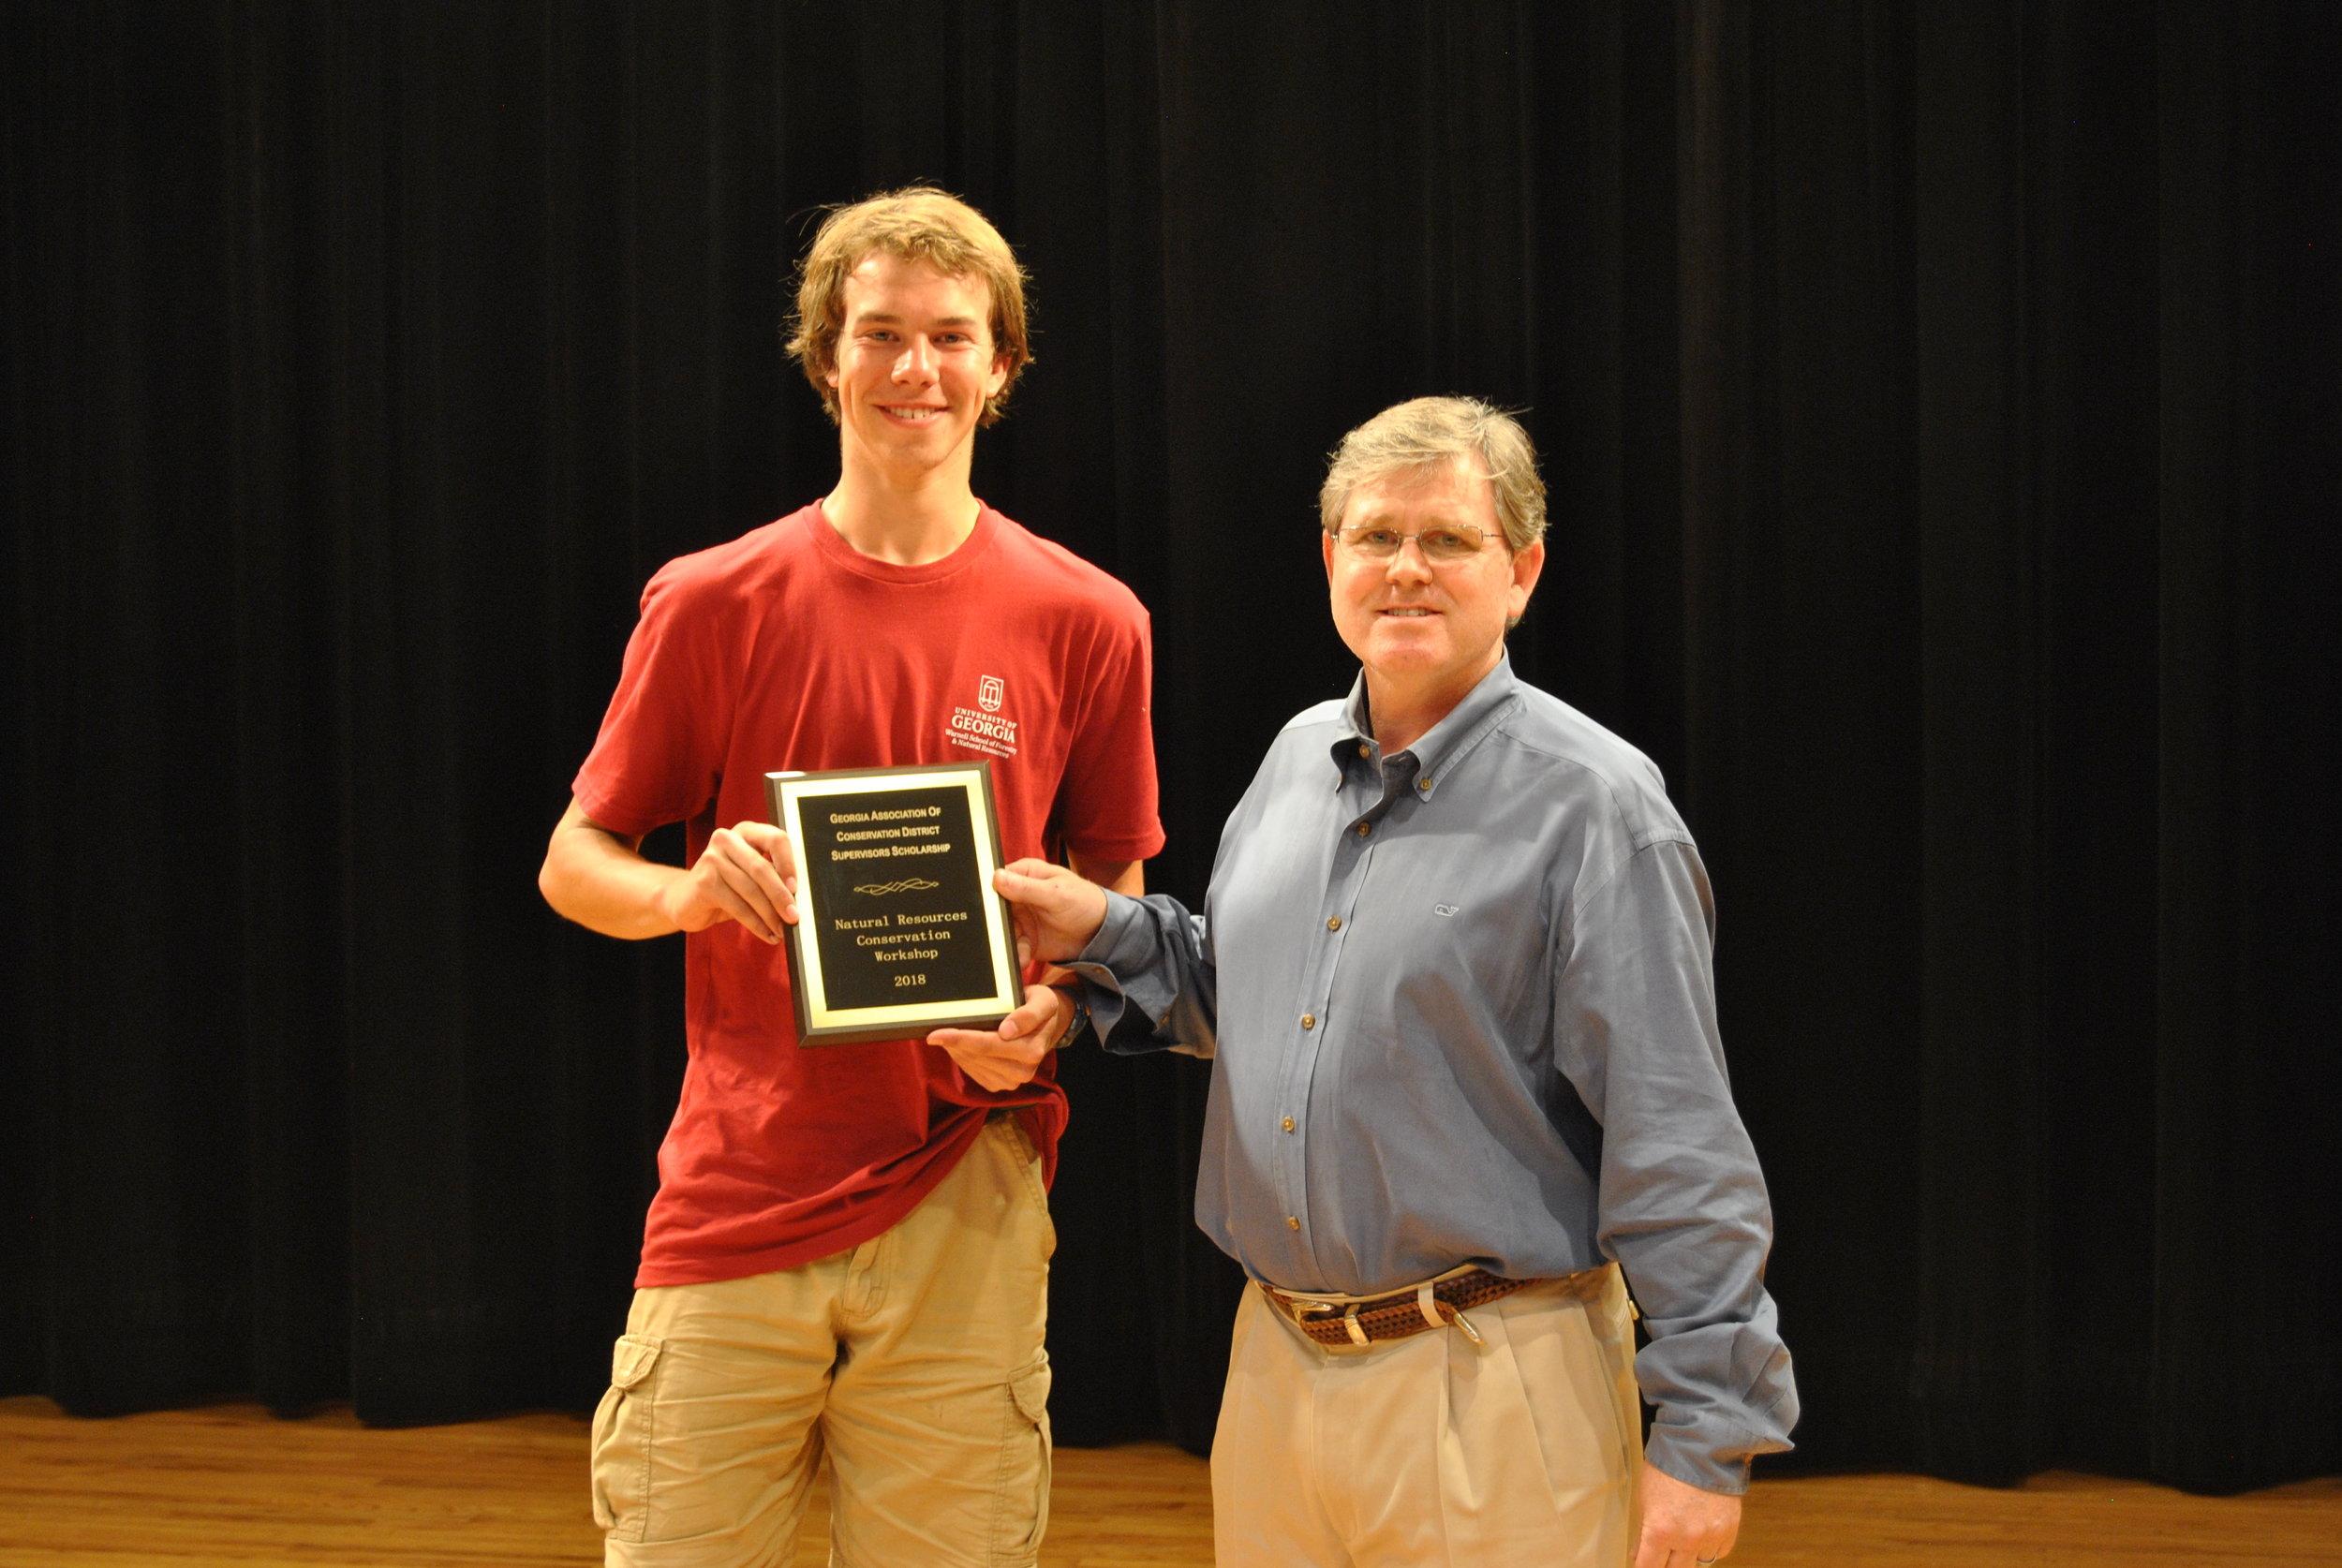 2018 GA Conservation District Scholarship winner Rhys Medcalfe.